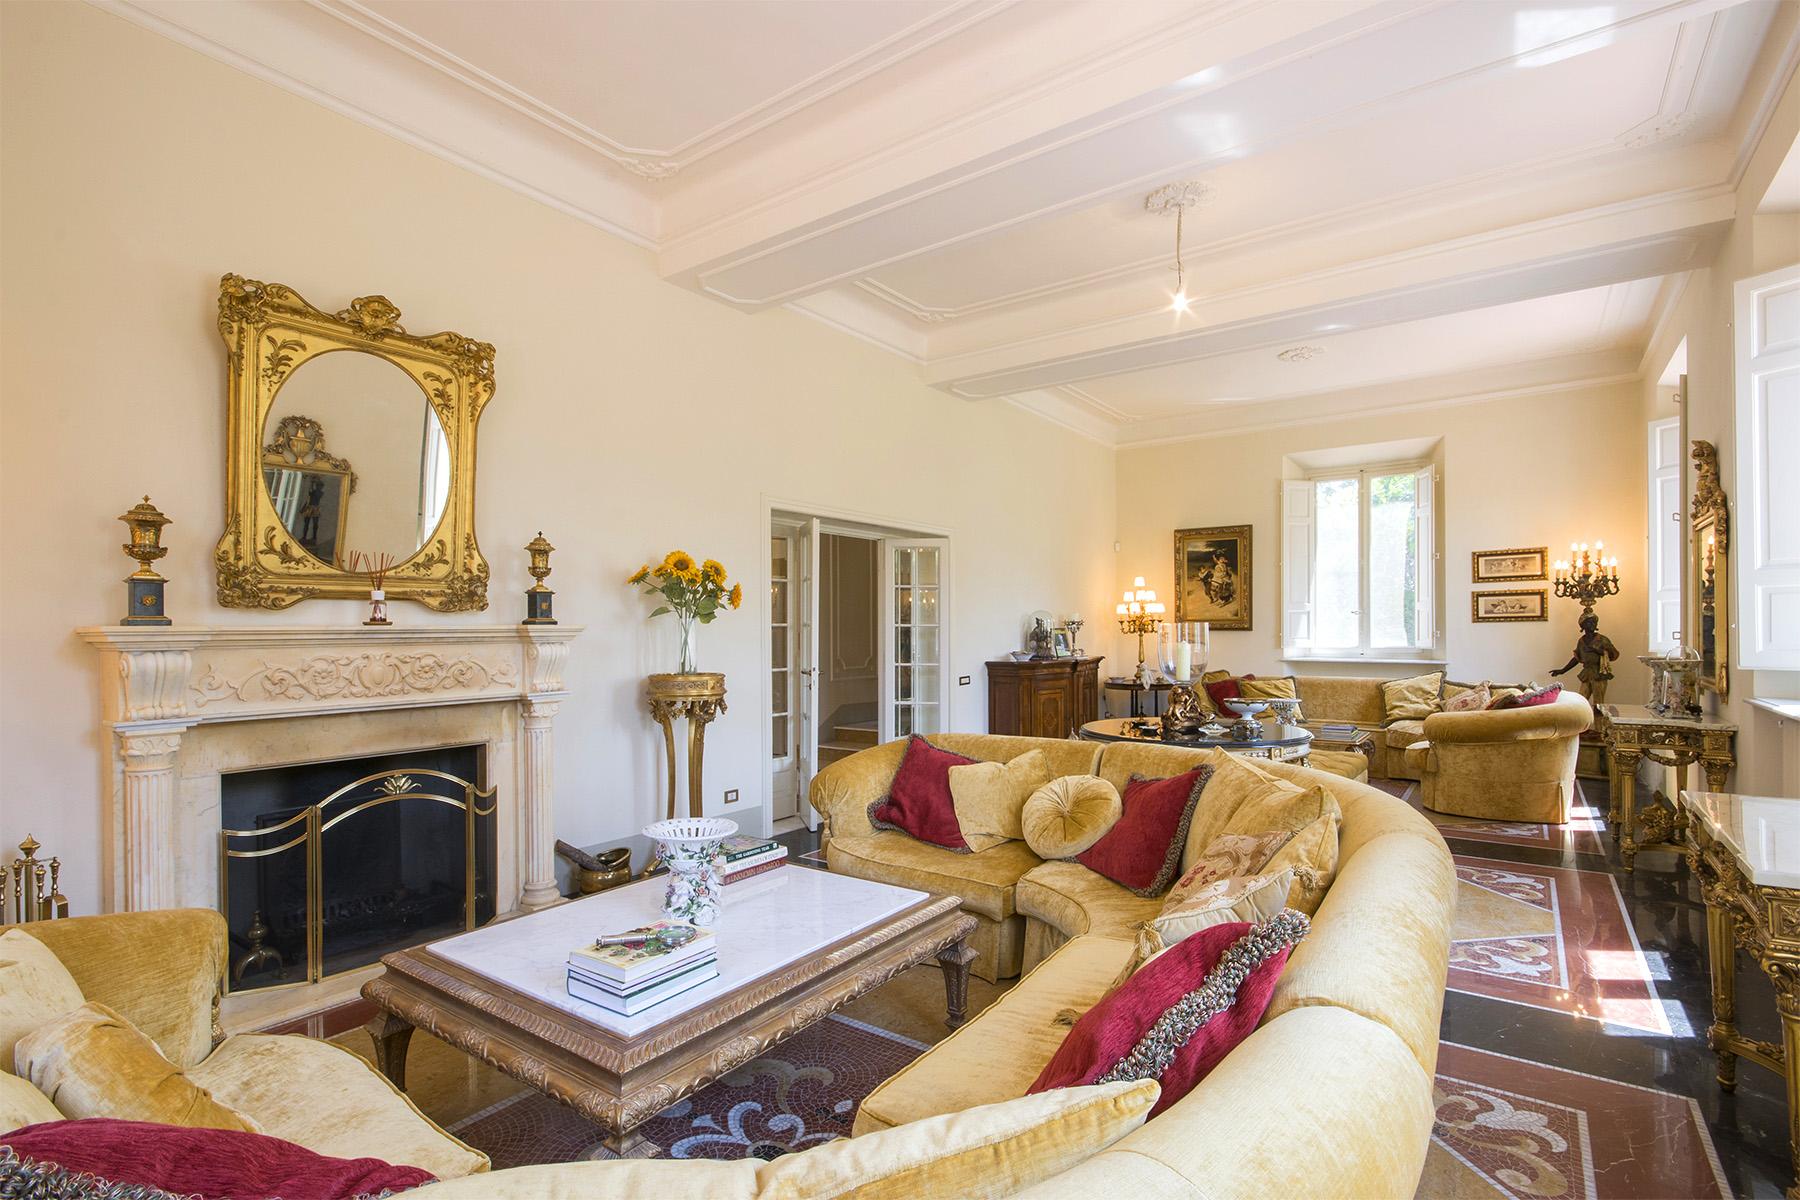 Villa in Vendita a Lucca: 5 locali, 760 mq - Foto 6